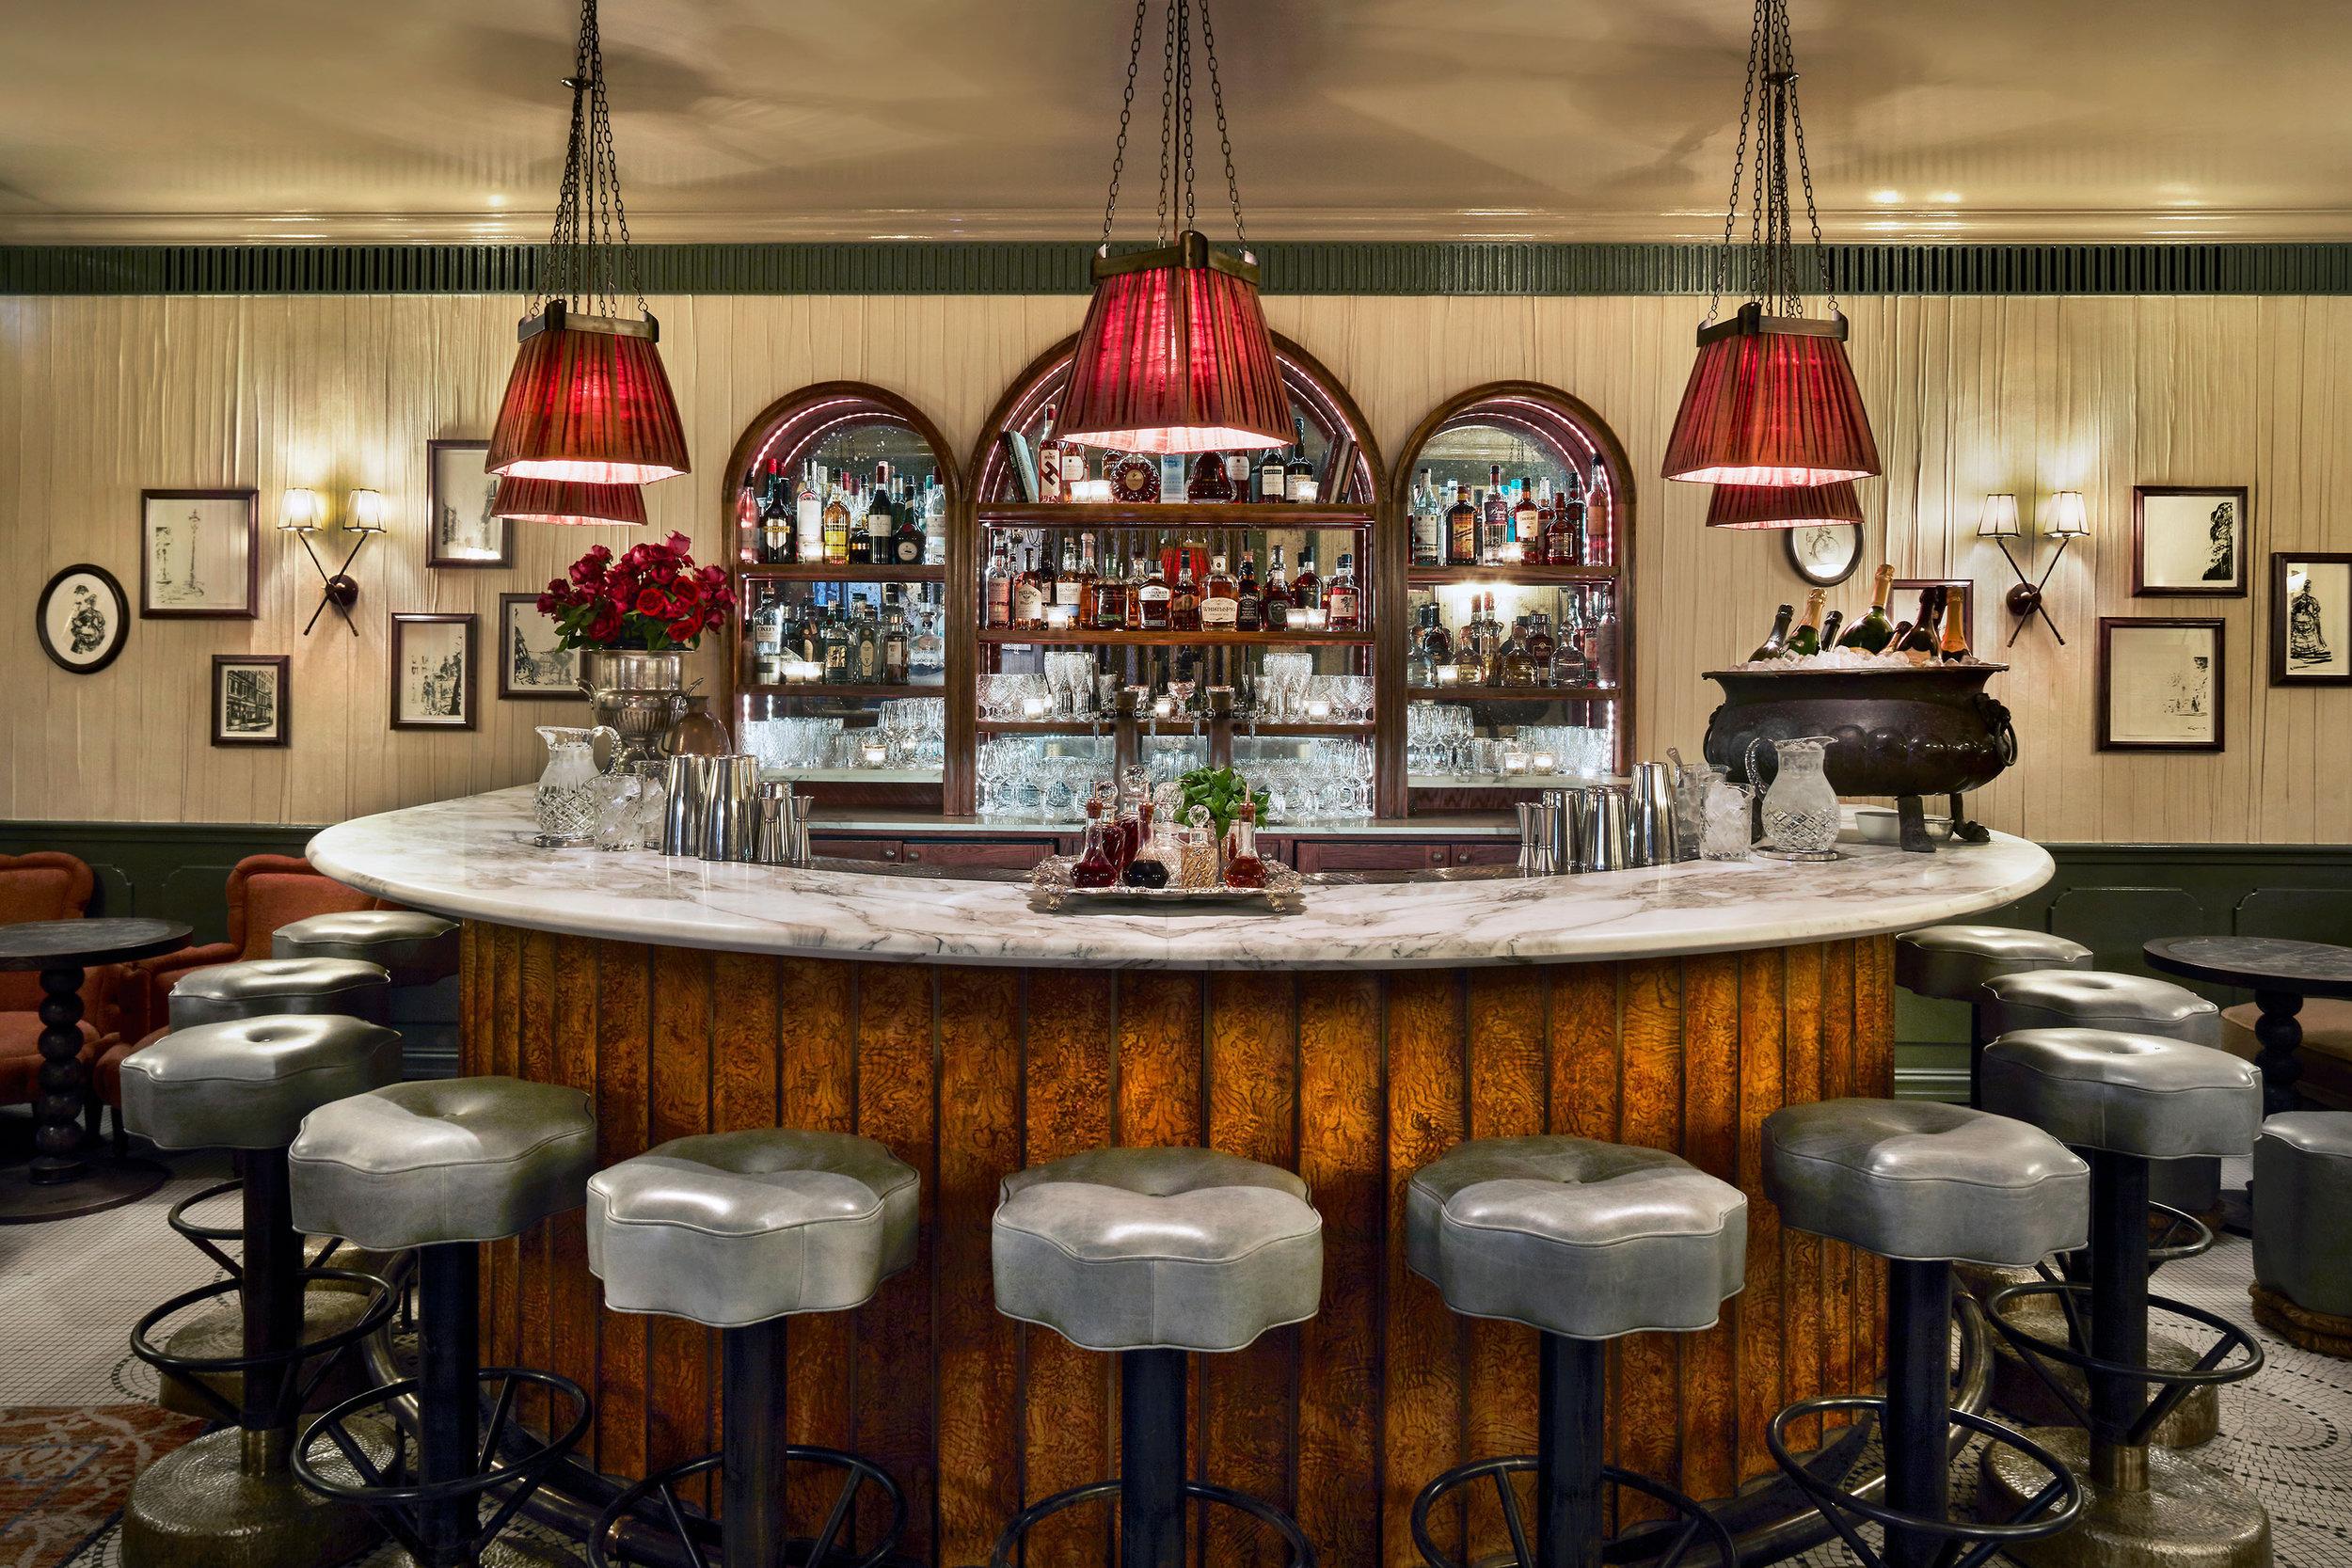 Copyright Soho House Kettners Townhouse Champagne Bar 1801 SB LR 001.jpg